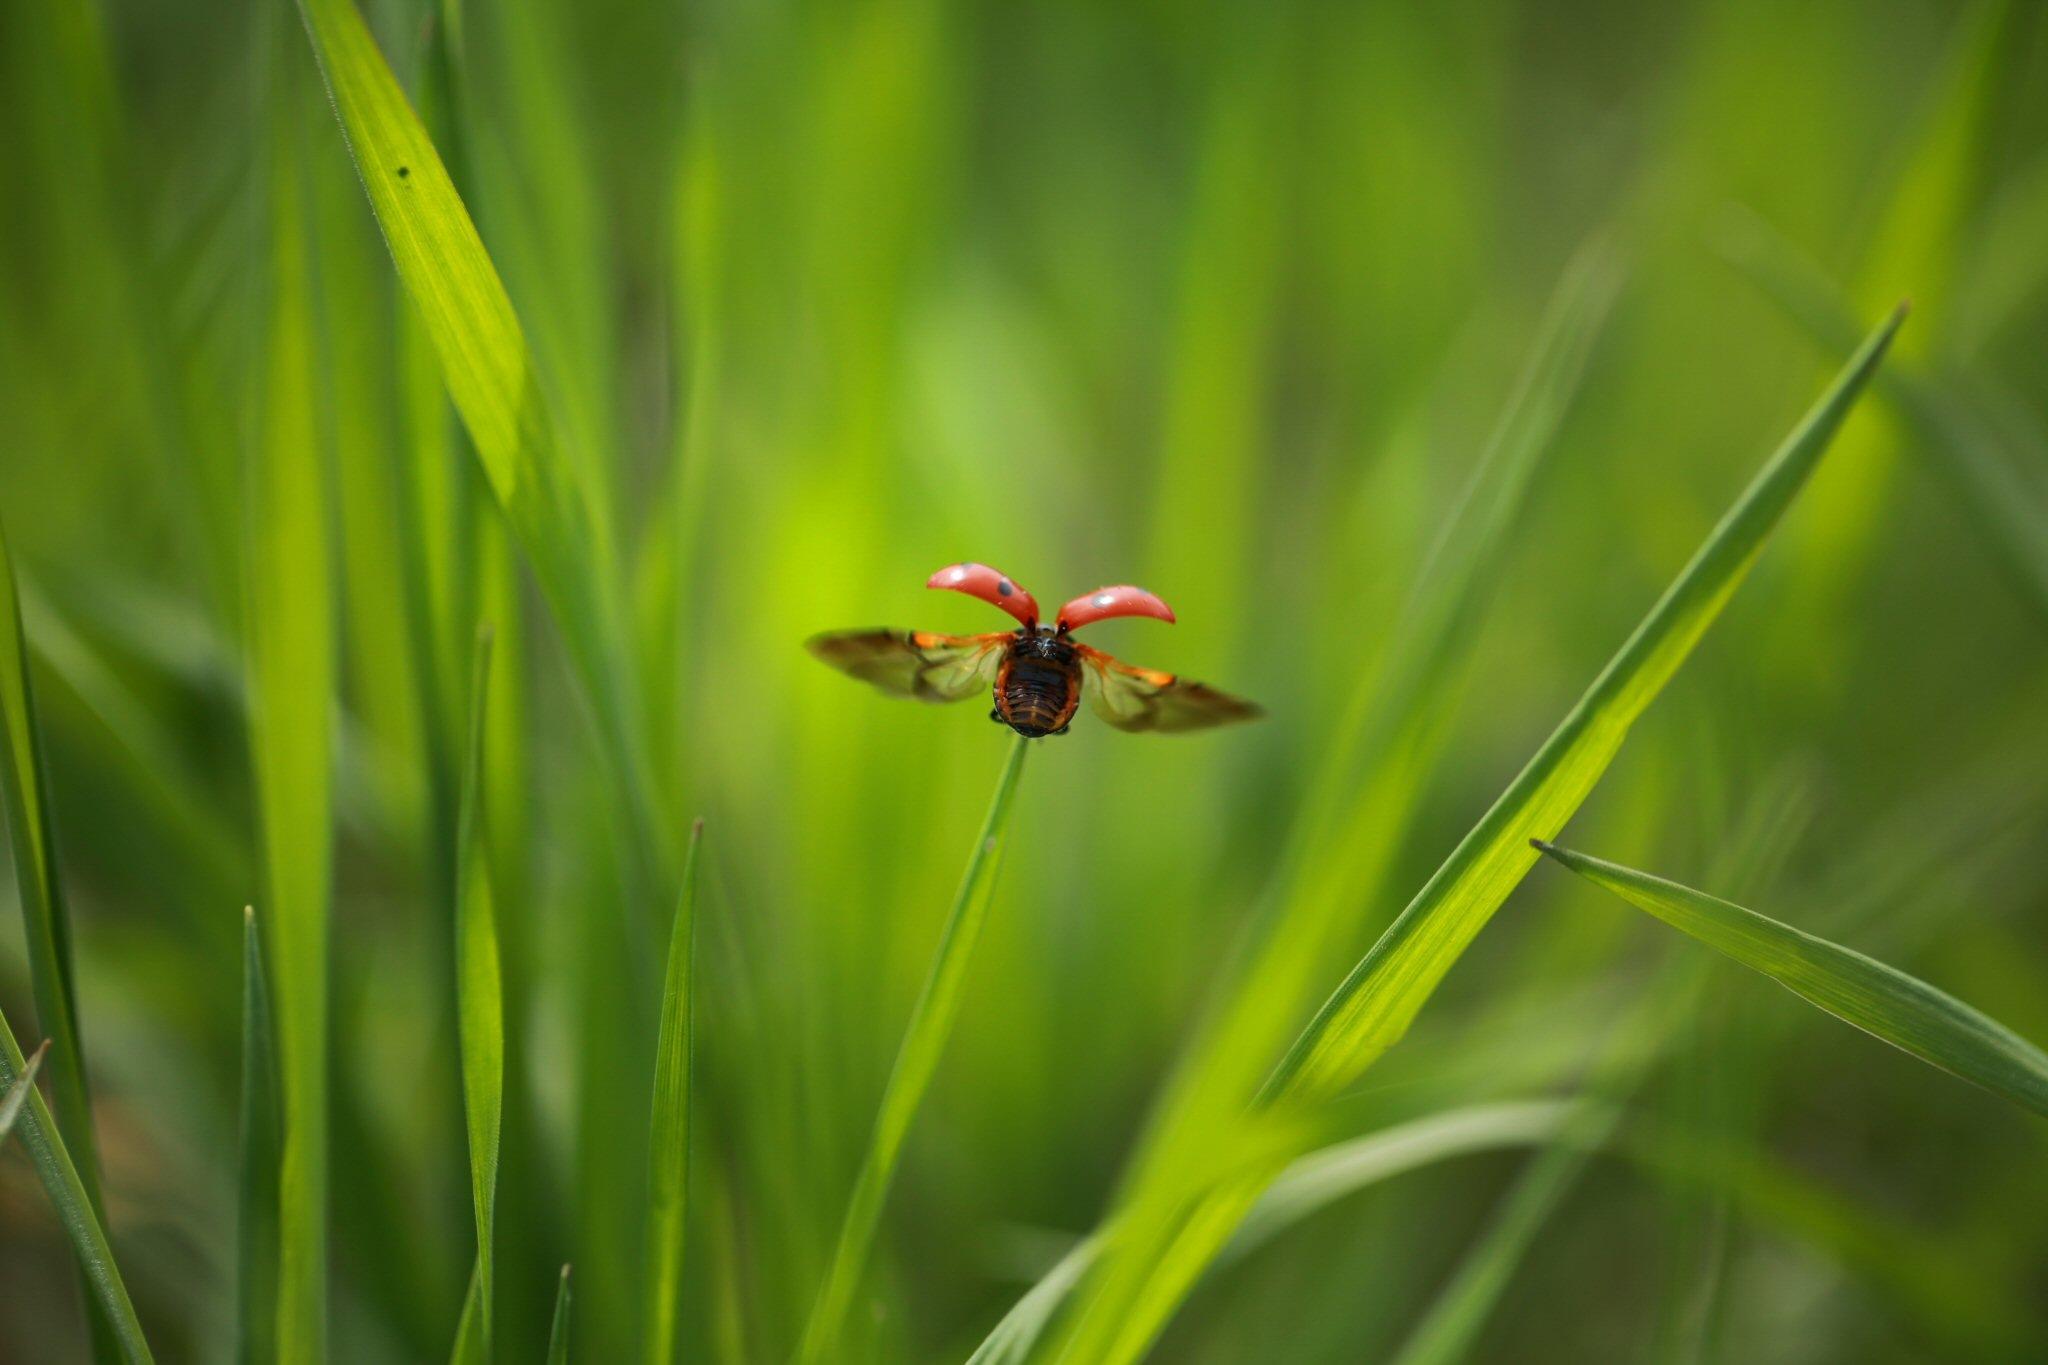 ladybug by bulentboz